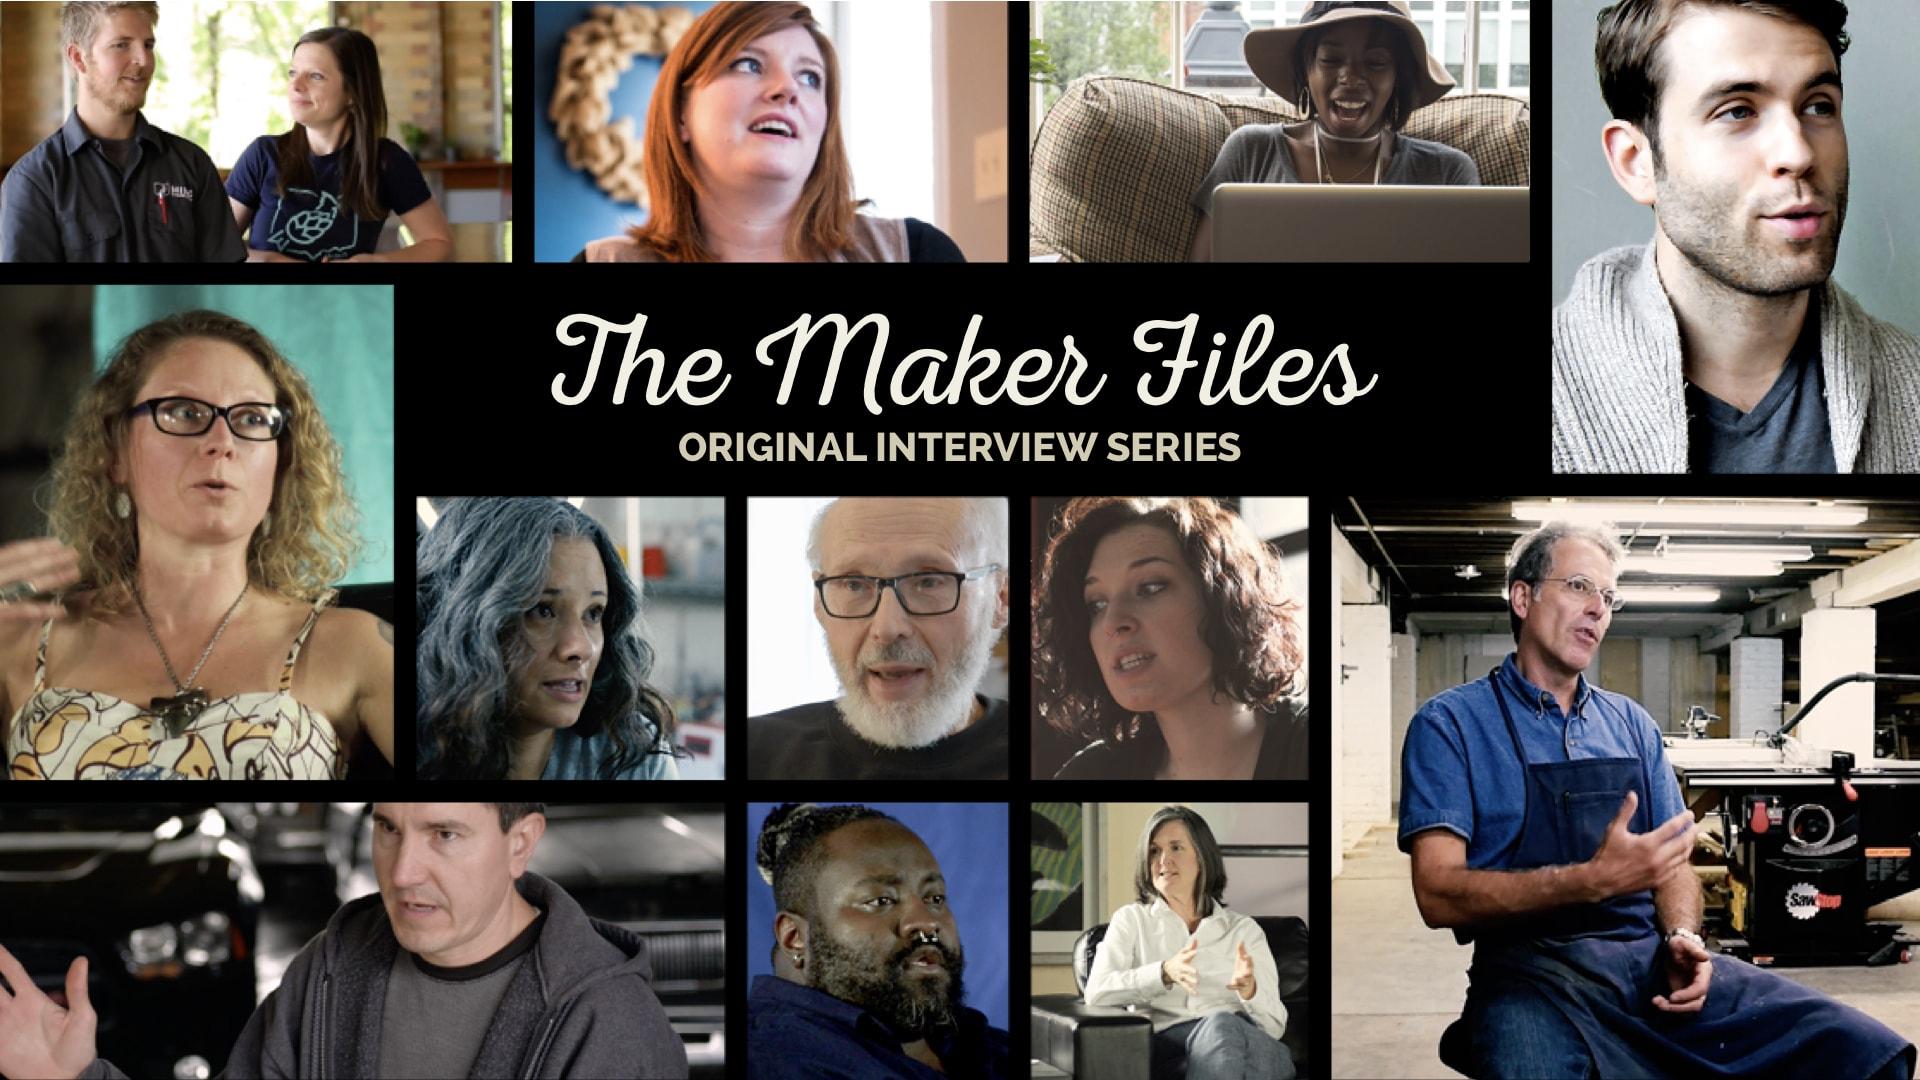 Maker-Files-Banner-1920x1080-min